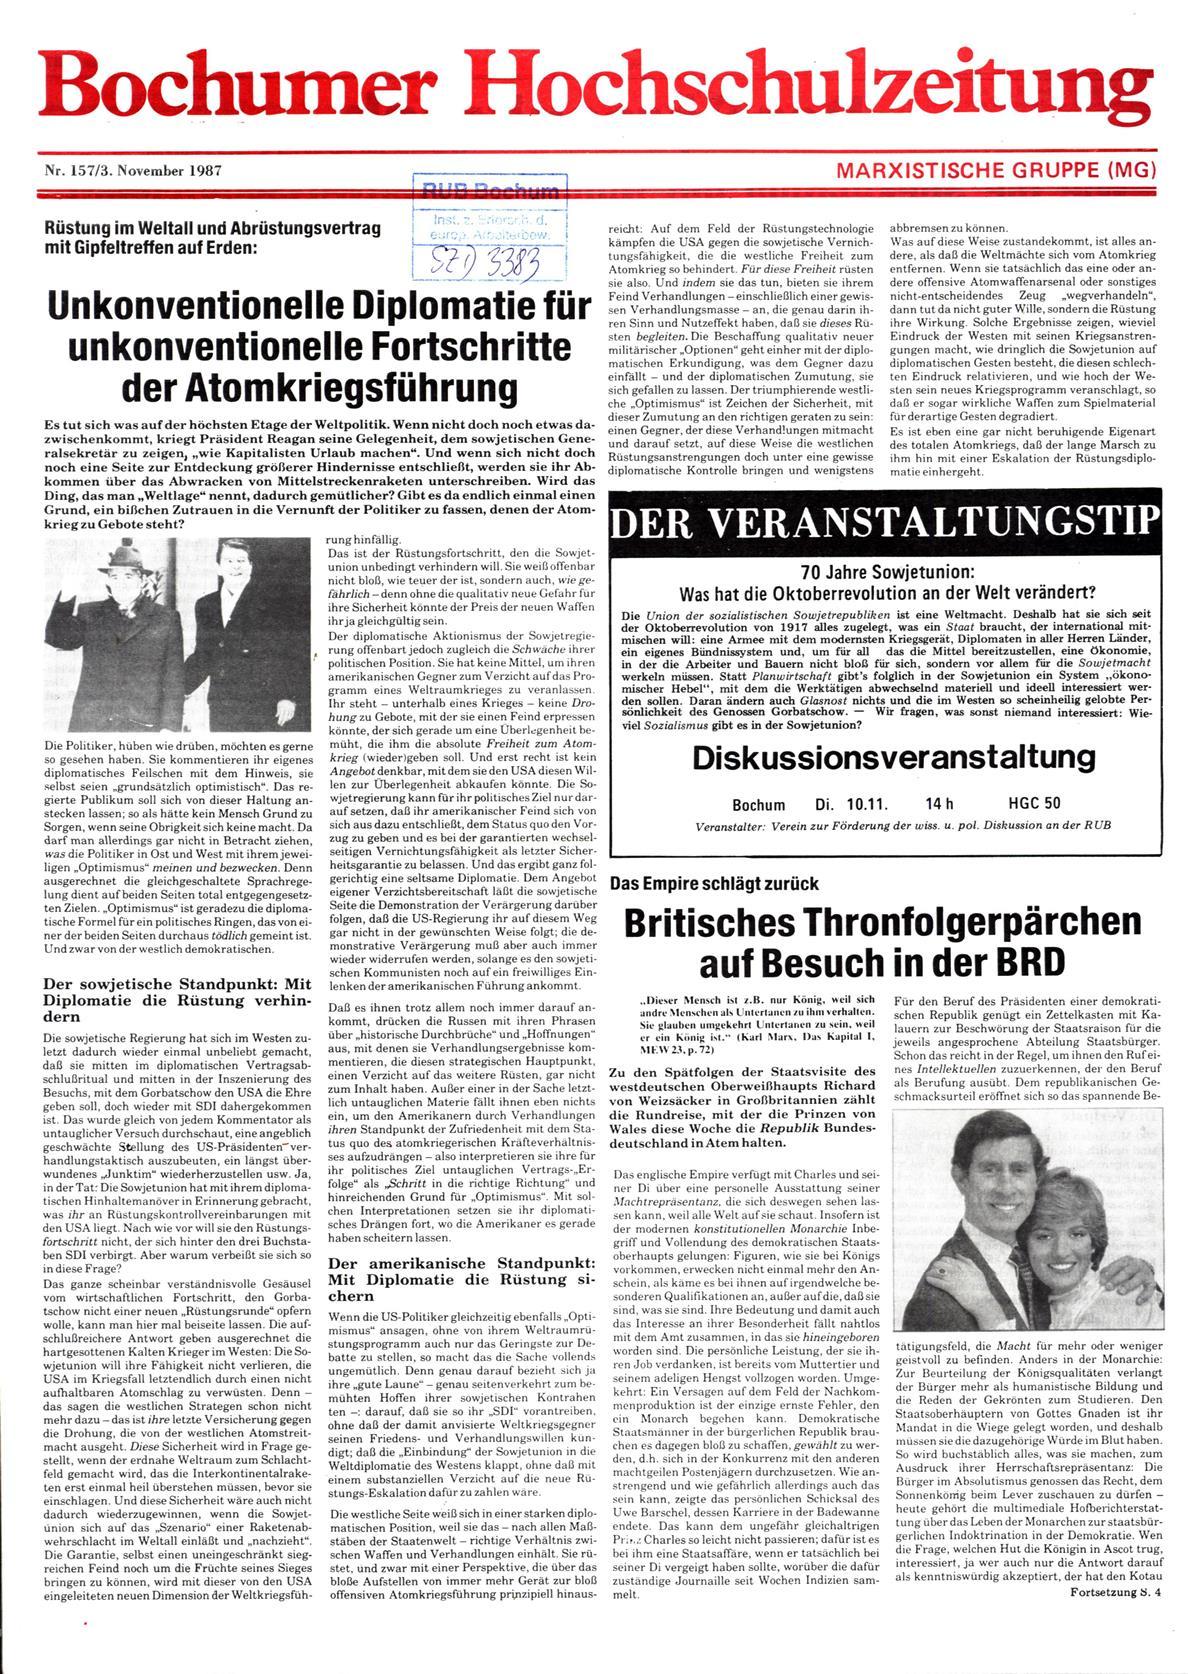 Bochum_BHZ_19871103_157_001